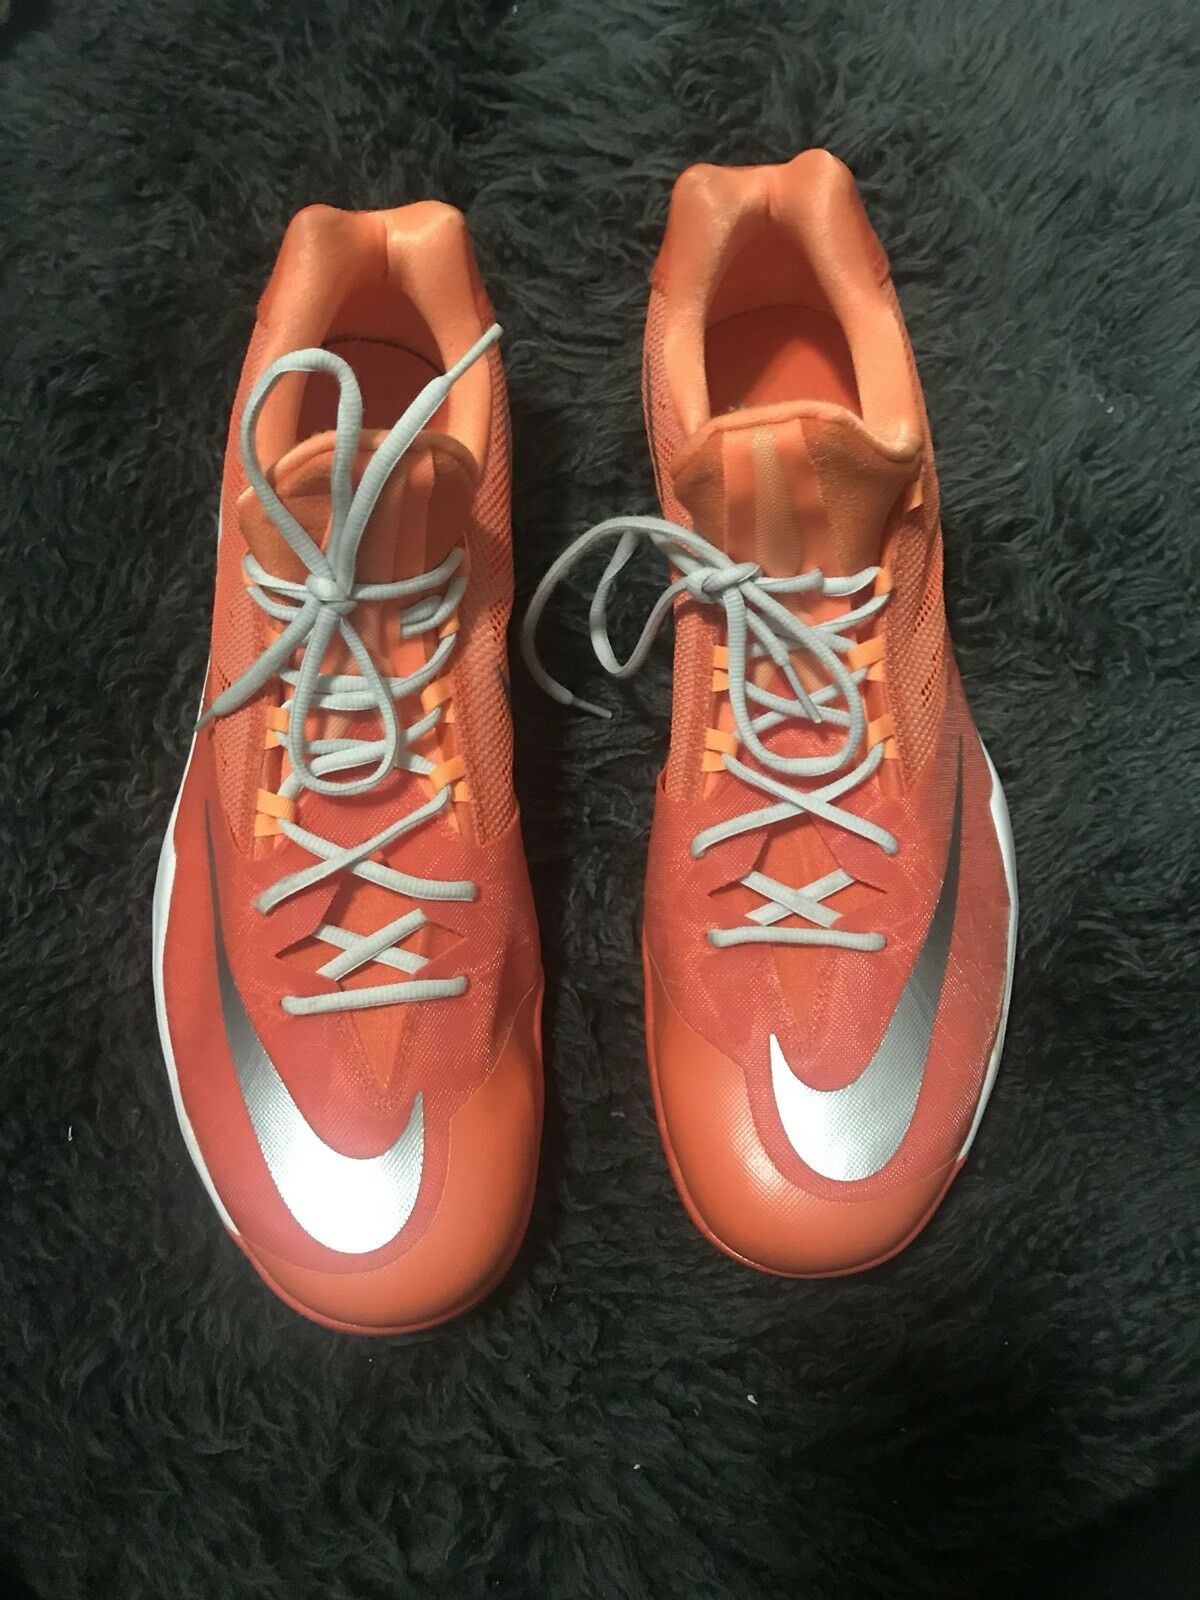 b81a10417 NIKE NIKE NIKE Mens Zoom Orange Mesh Detail Sneakers Size 18 d776ae ...